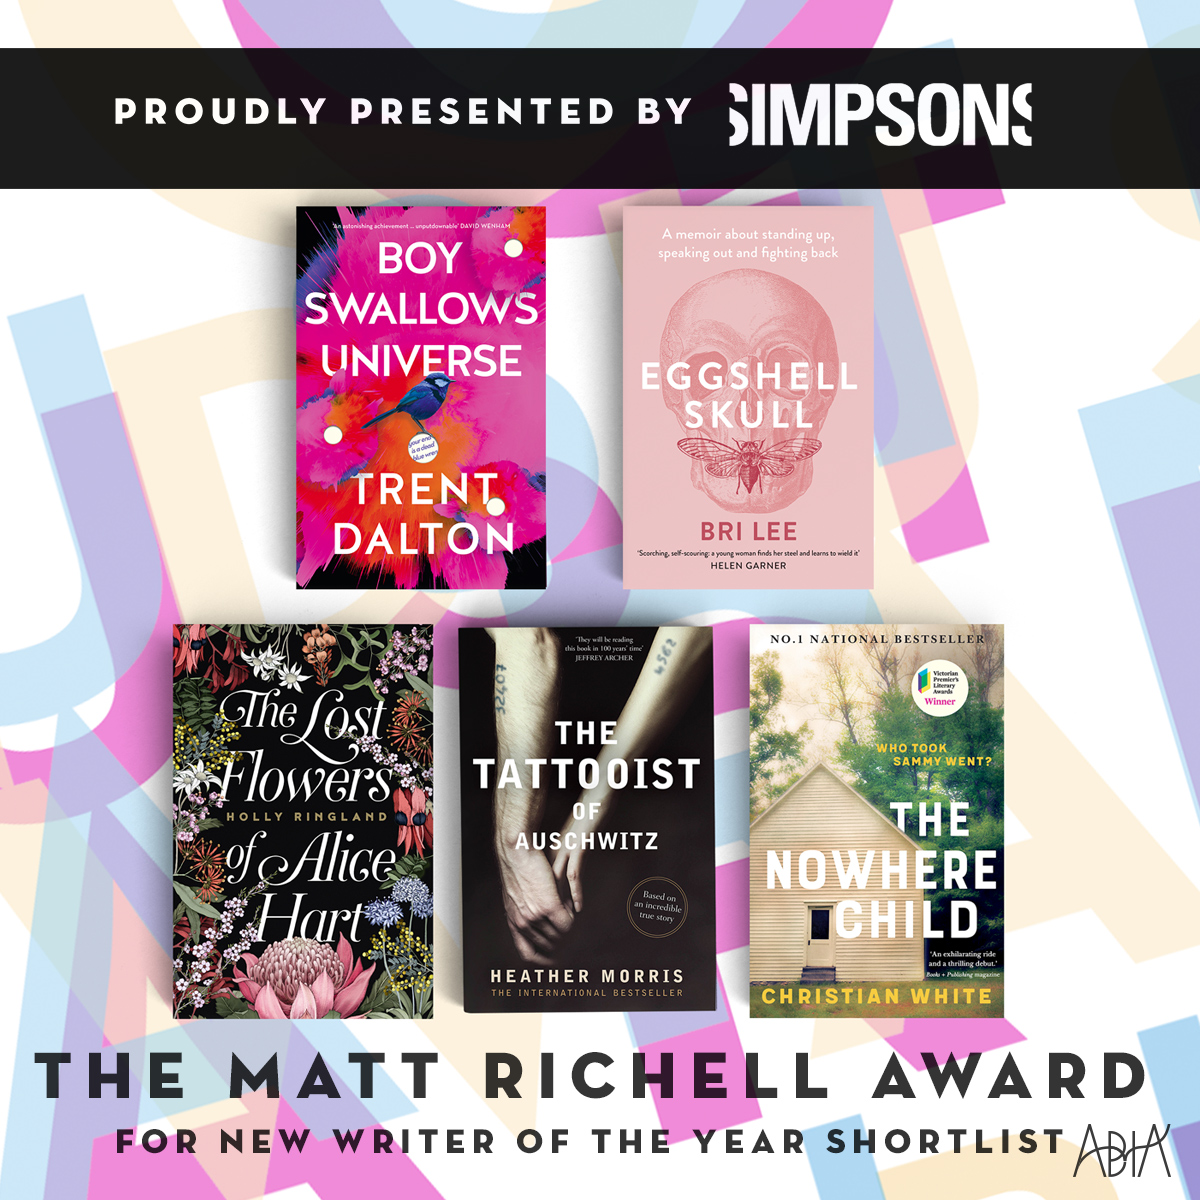 ABIA2019_The-Matt-Richell-Award-1.jpg